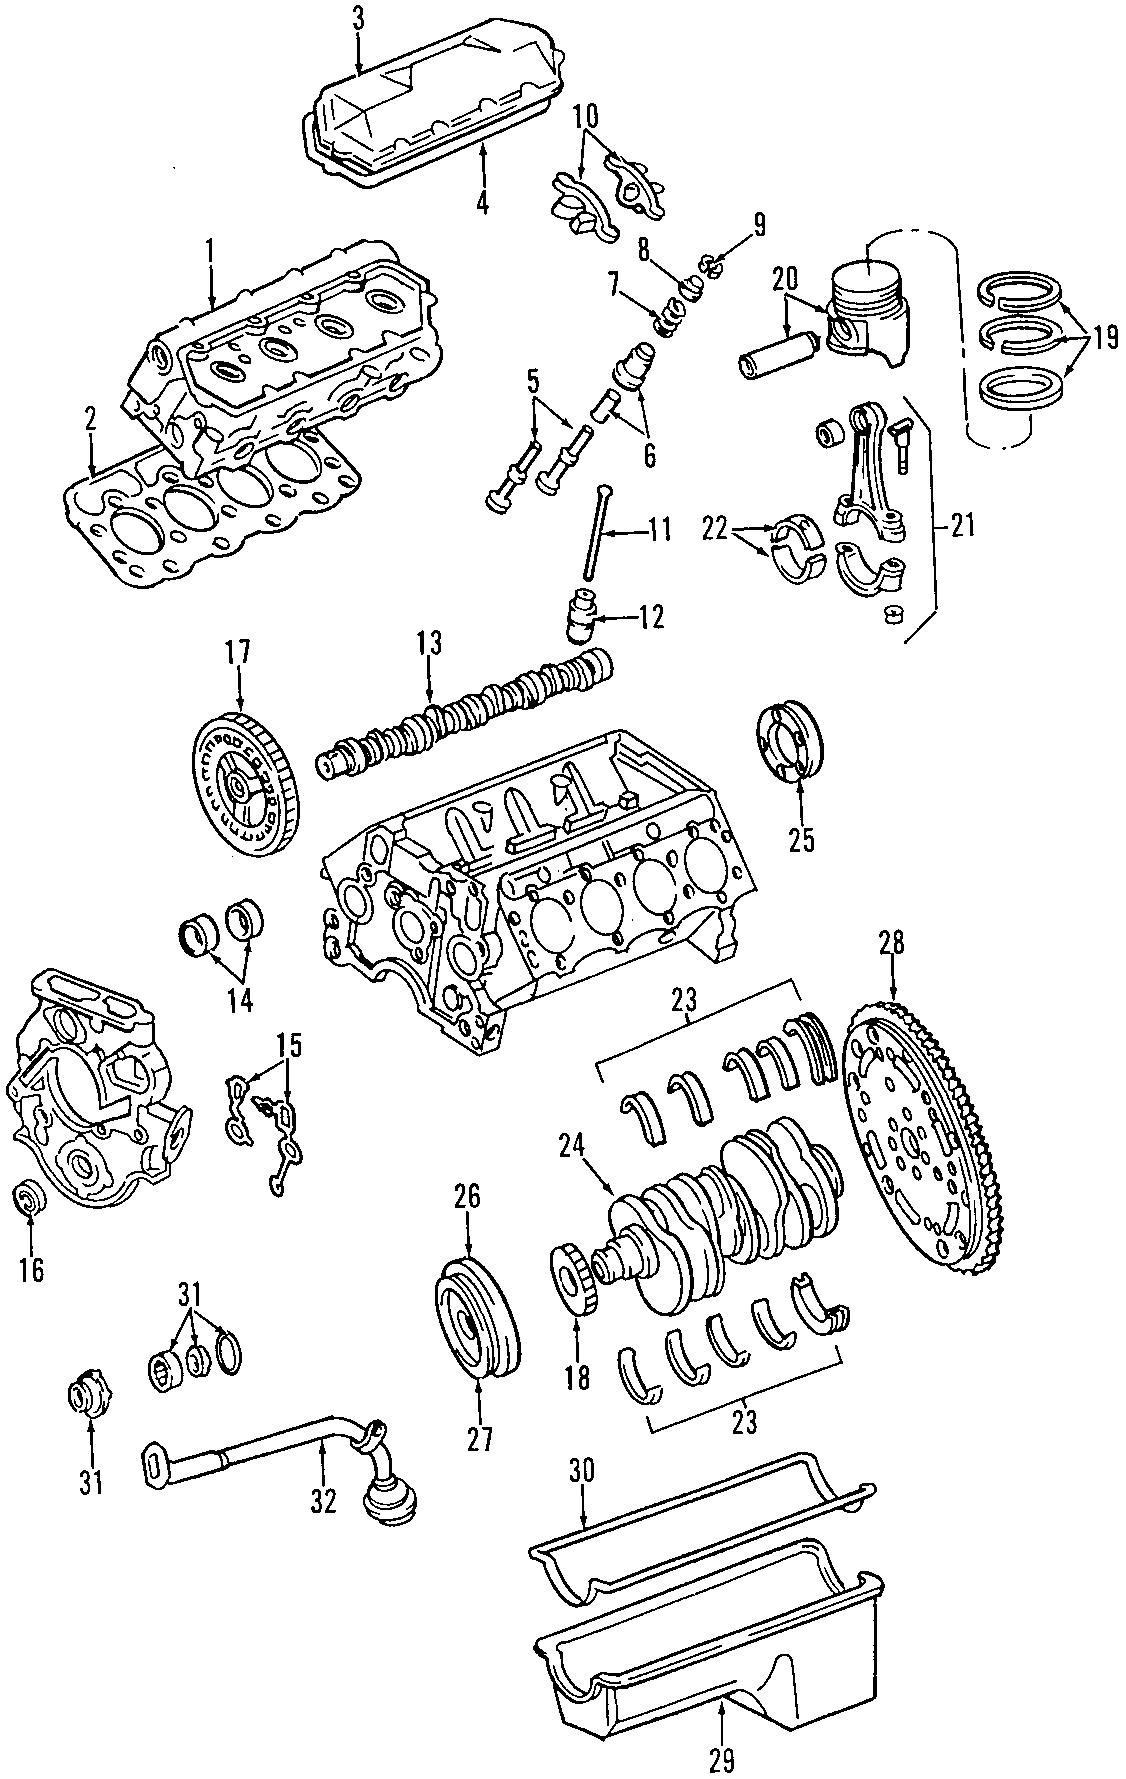 Ford E-350 Super Duty Engine Crankshaft Seal. 7.3 LITER